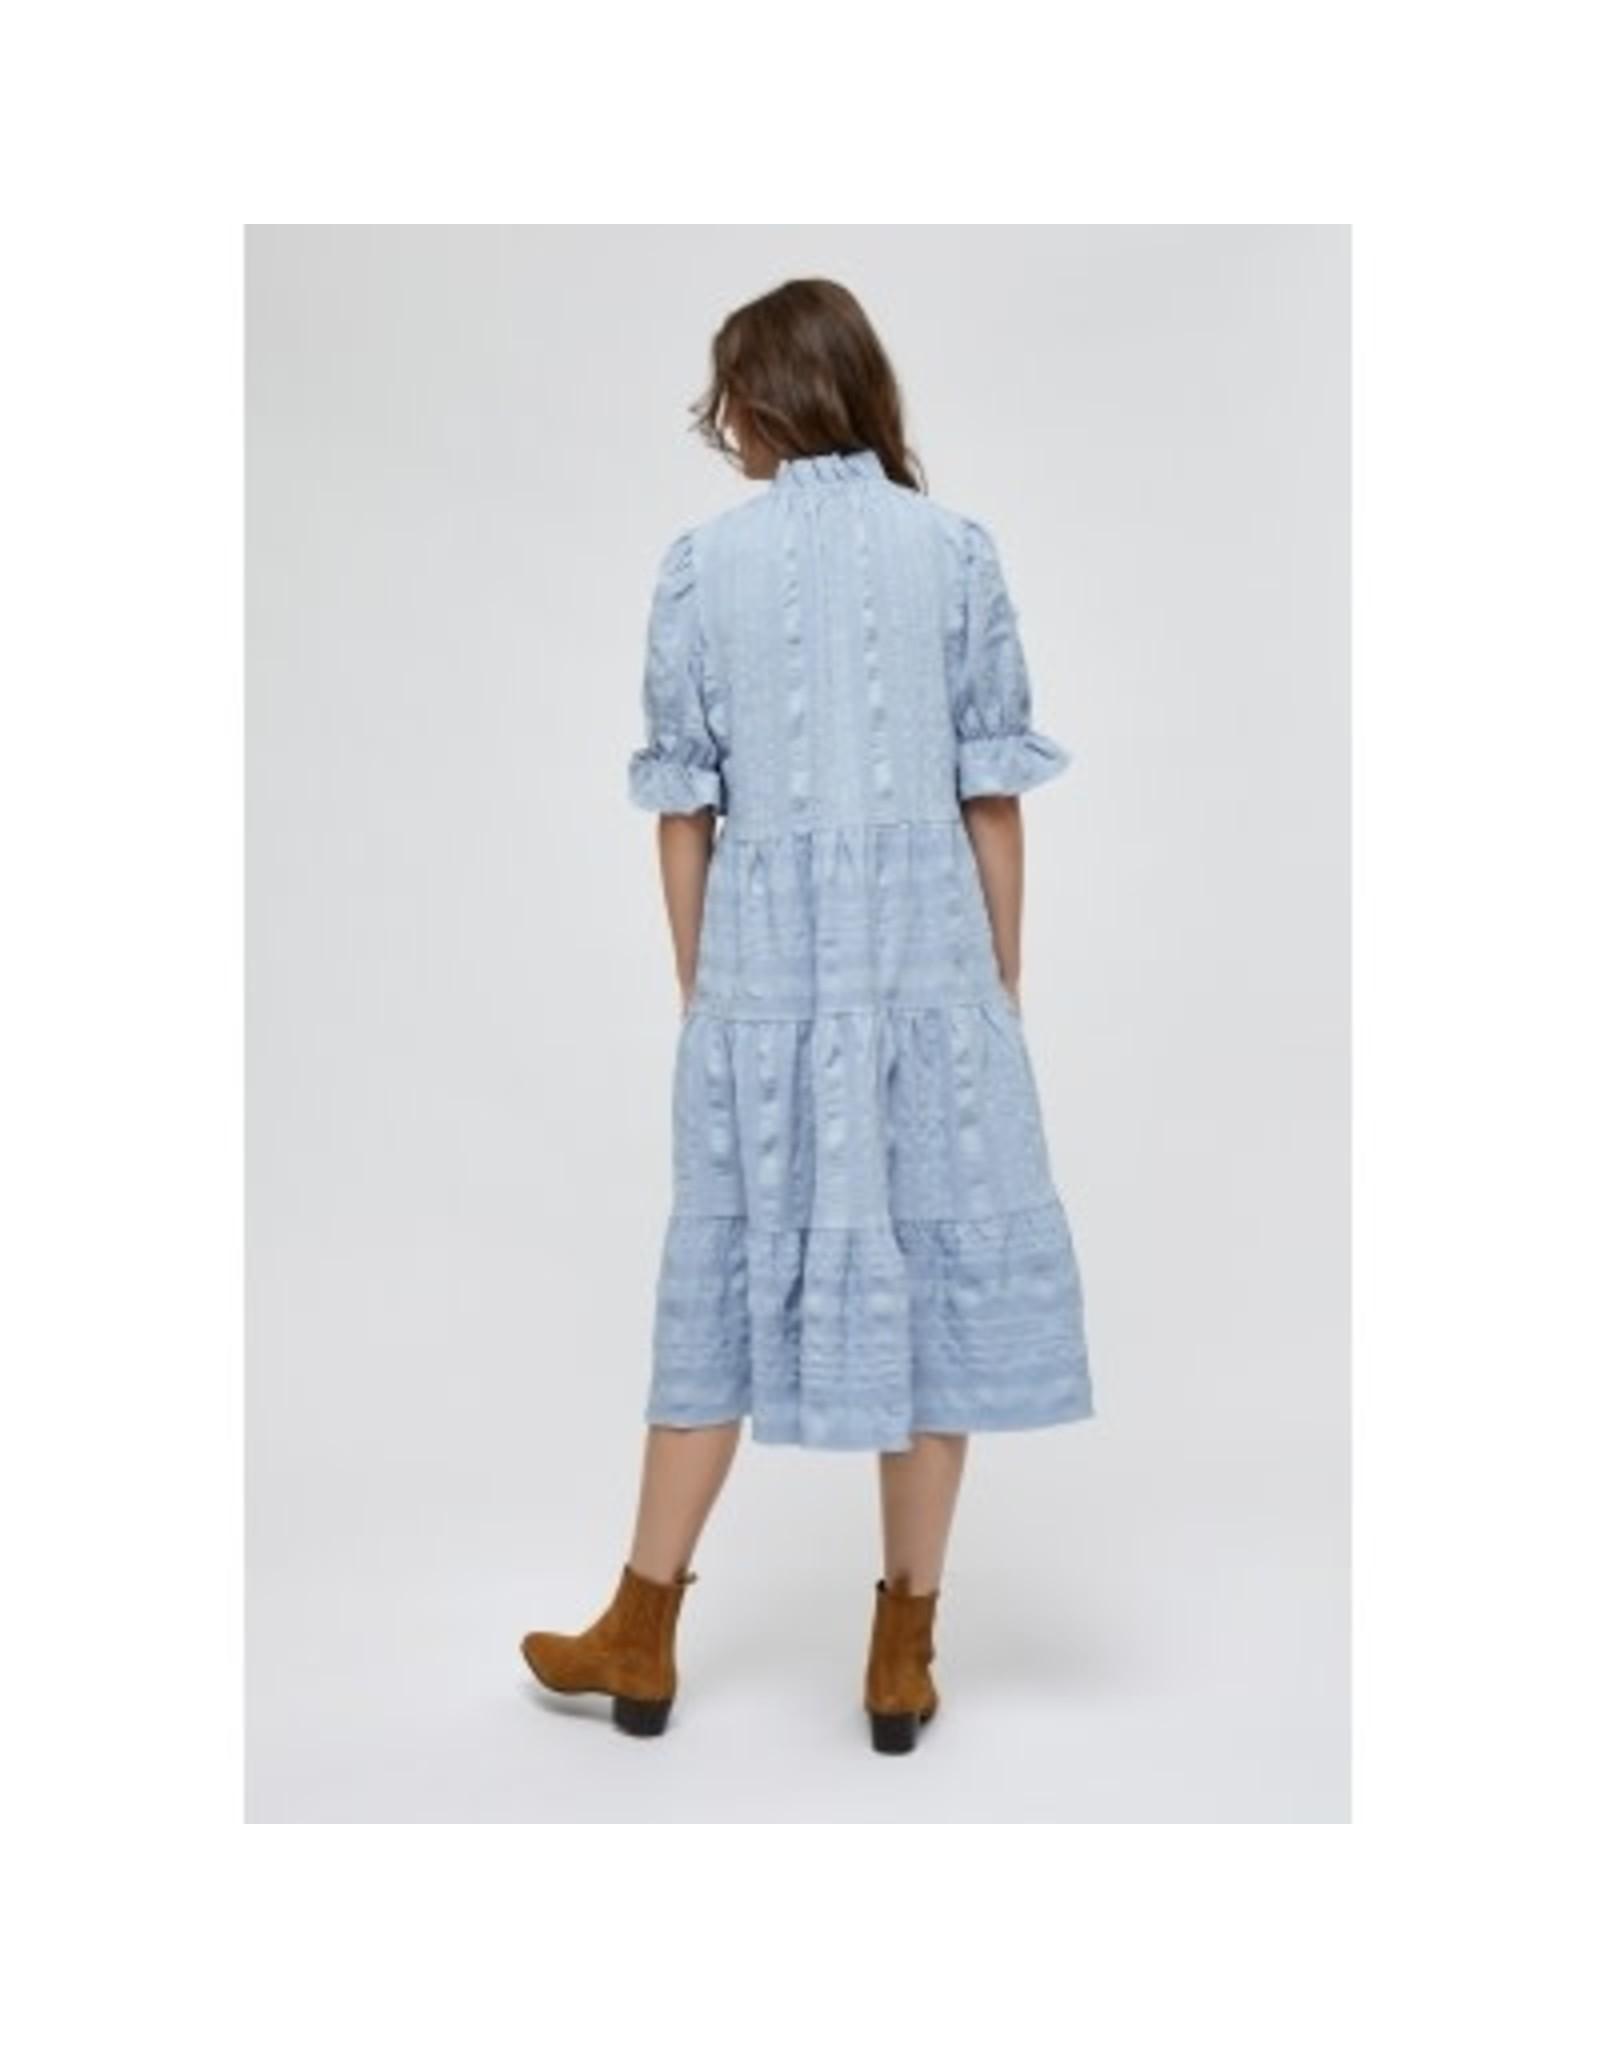 Minus Bergitta Dress